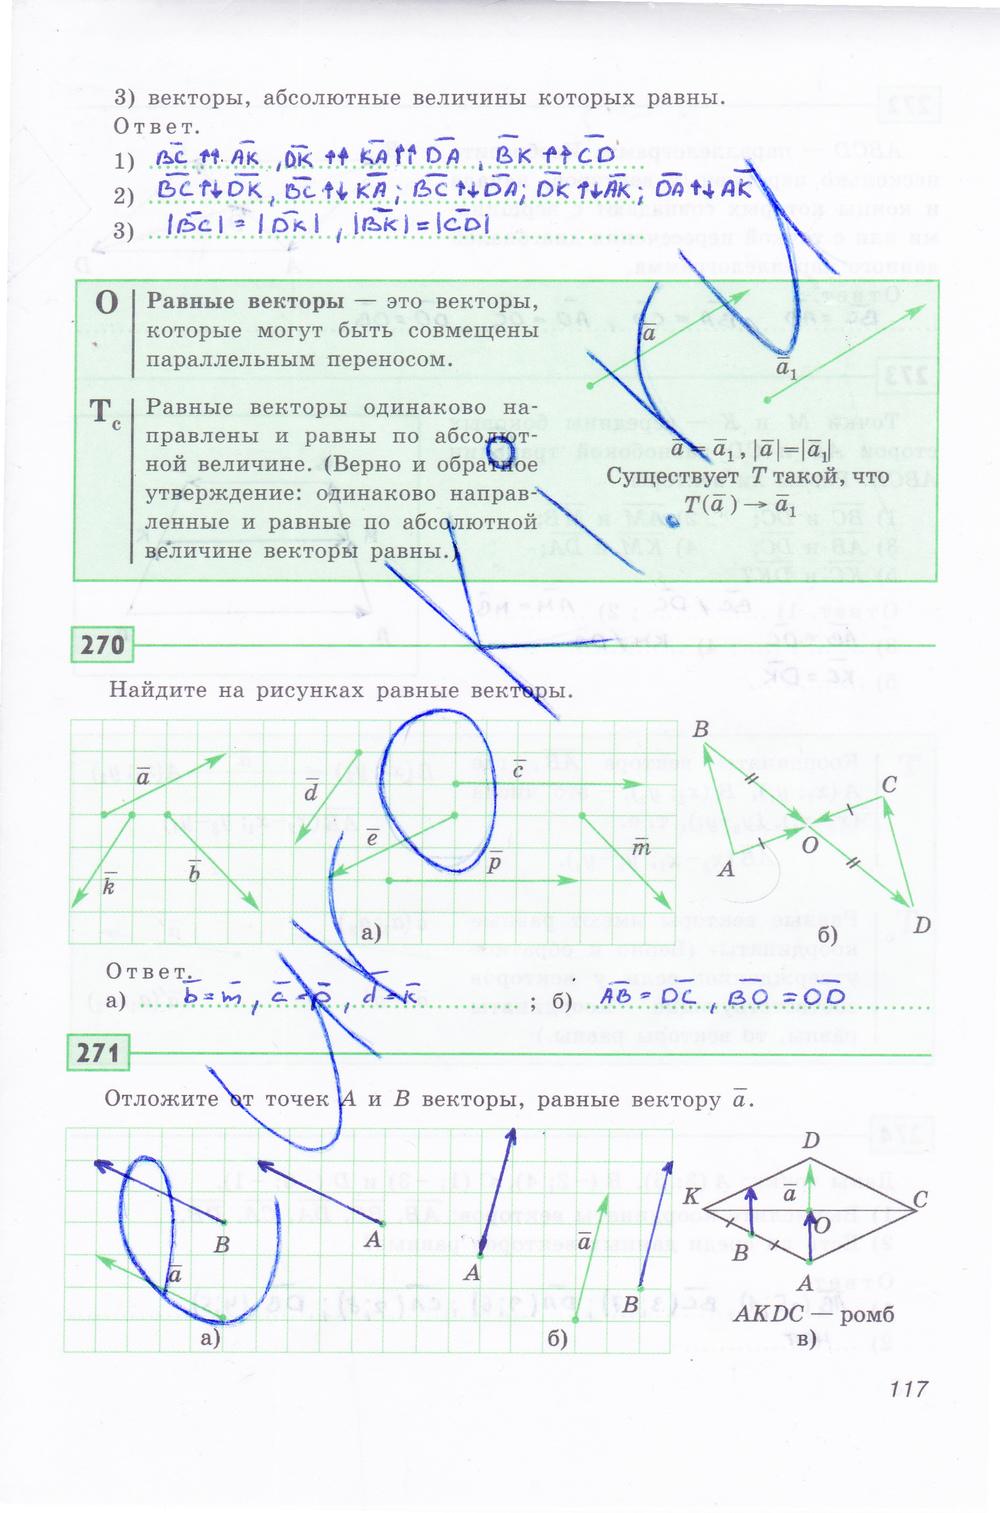 гдз к рабочей тетради по геометрии за 8 класс